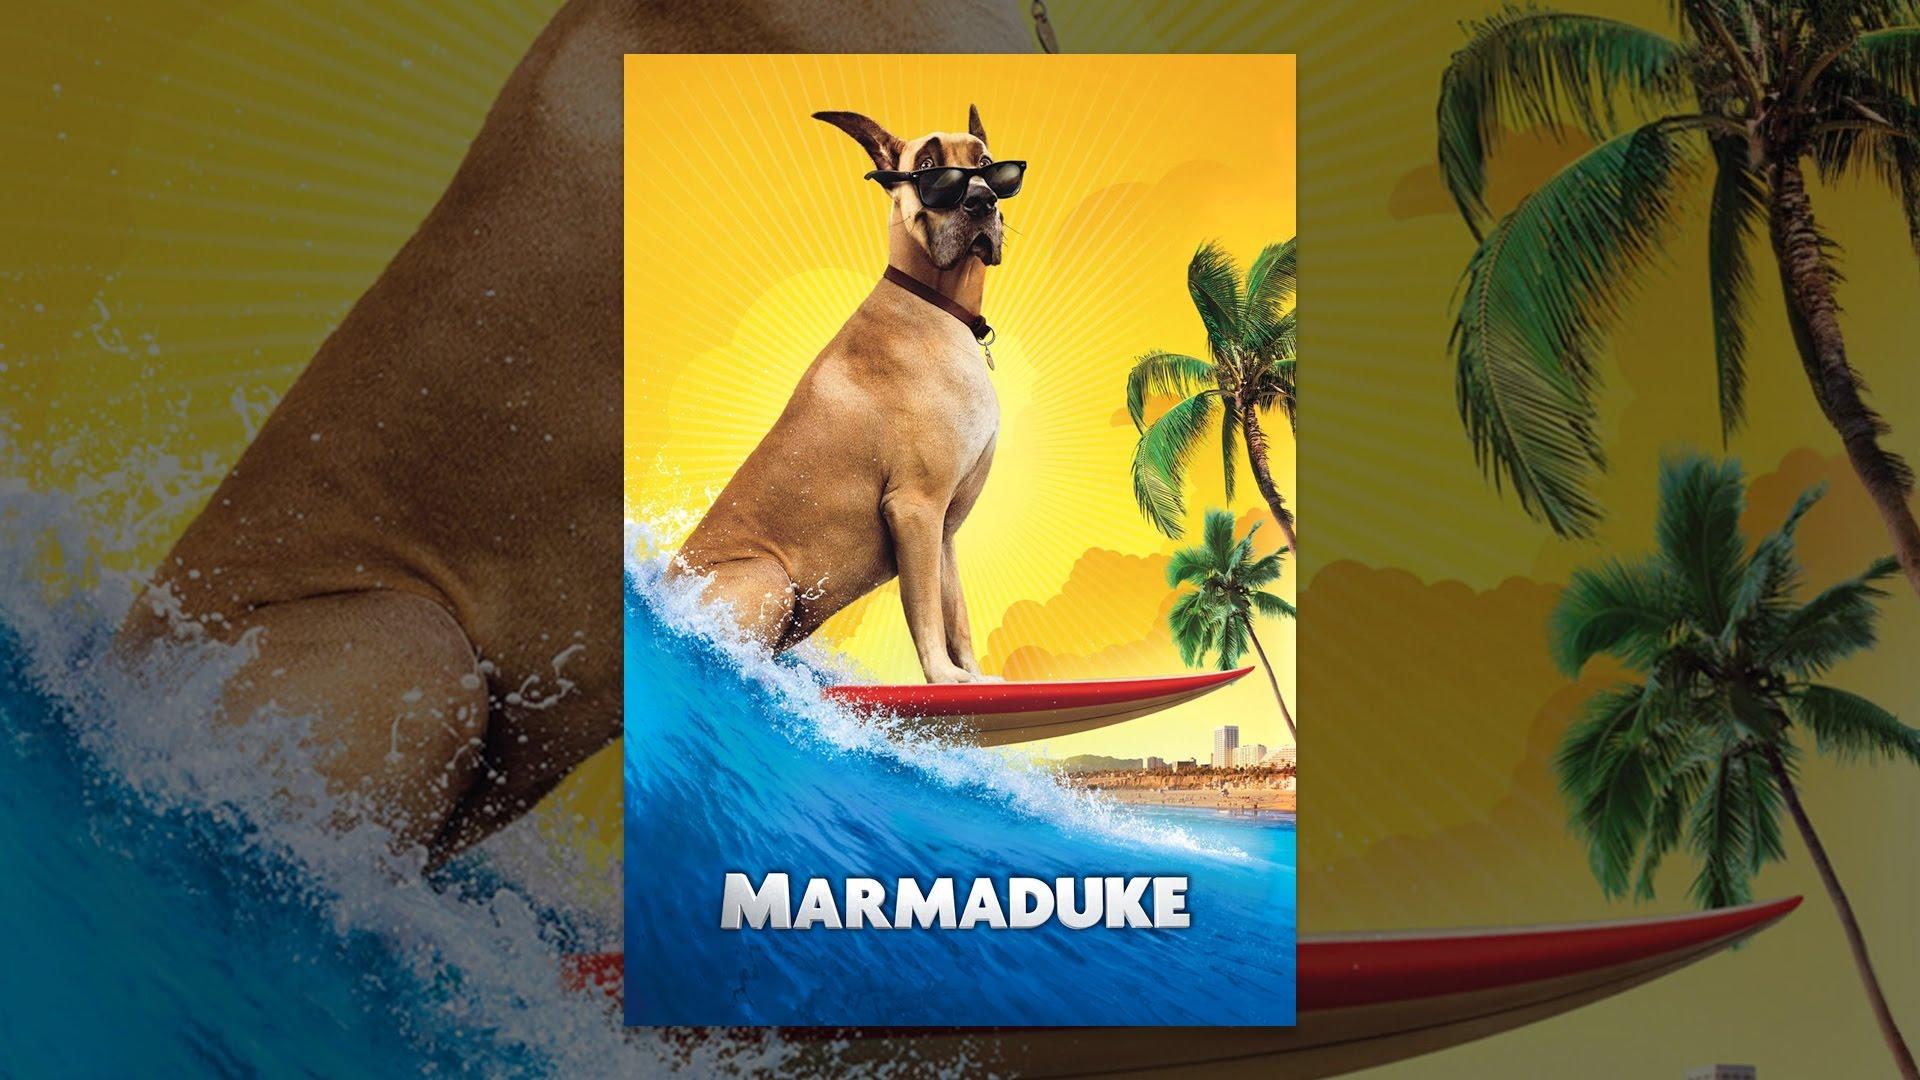 Marmaduke cast